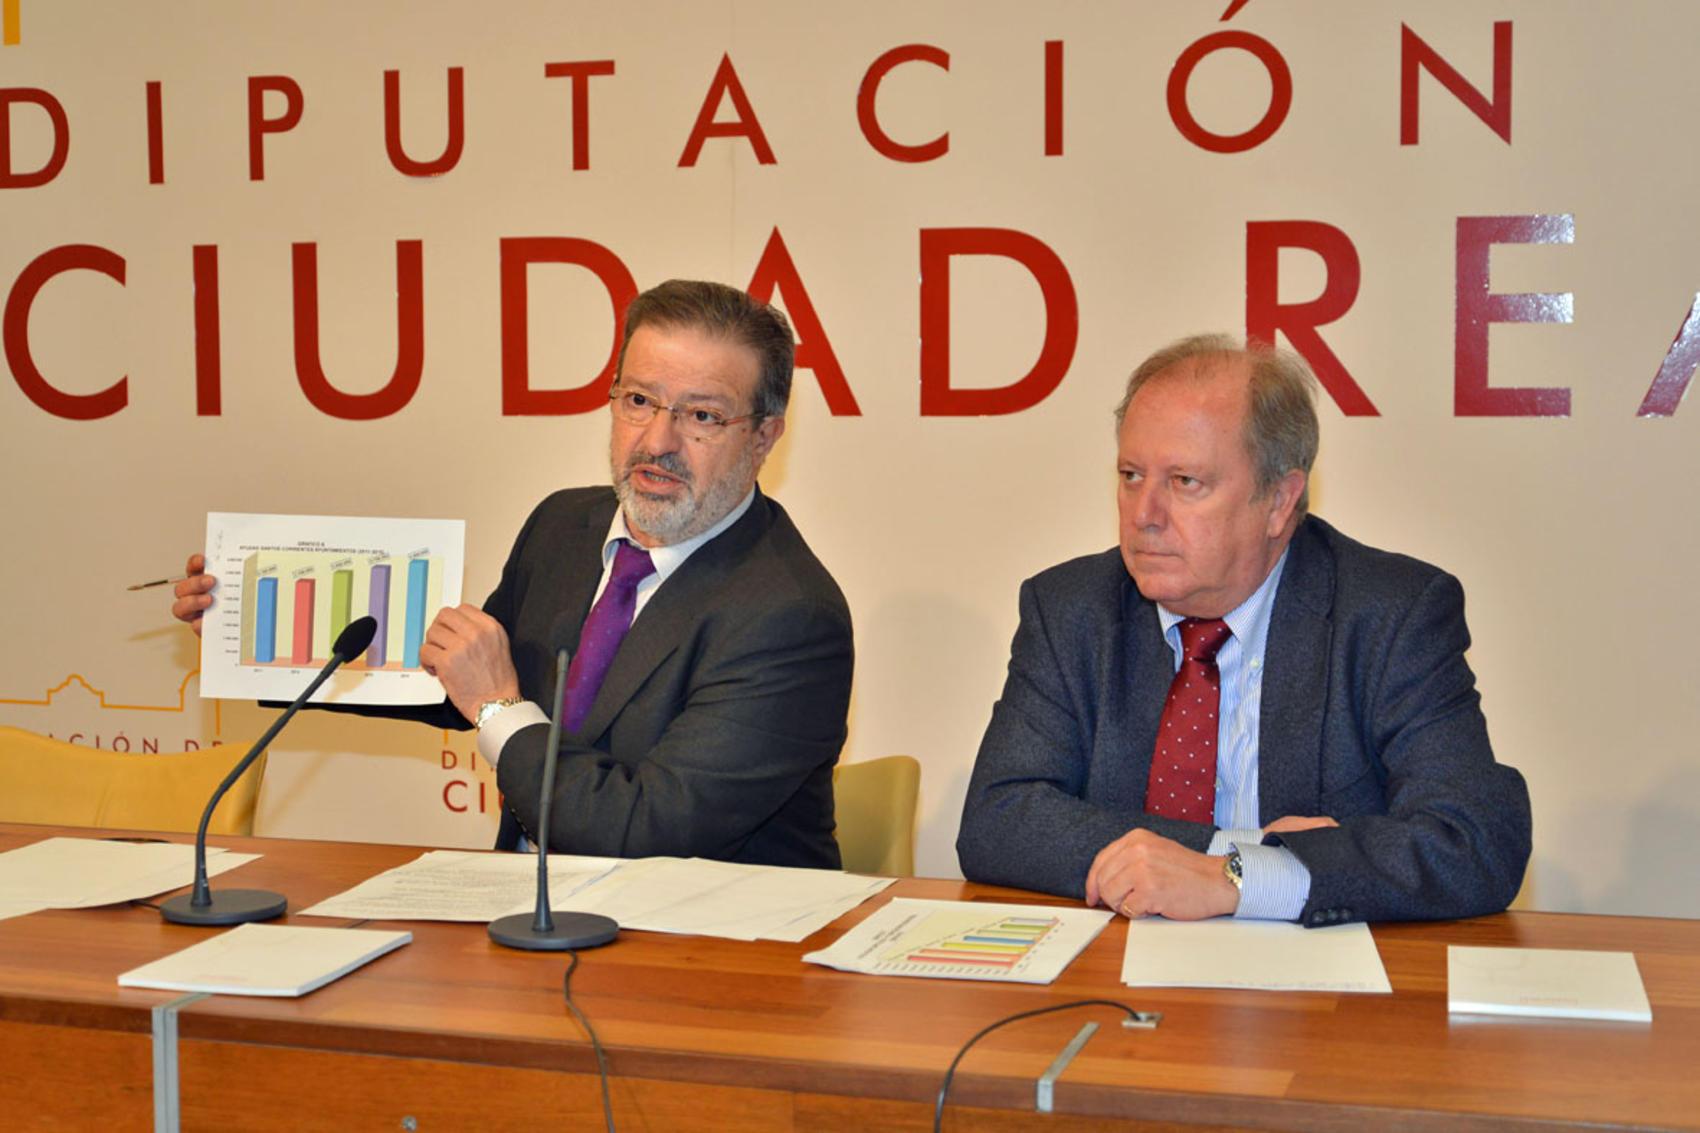 diputacion presupuestos 2015